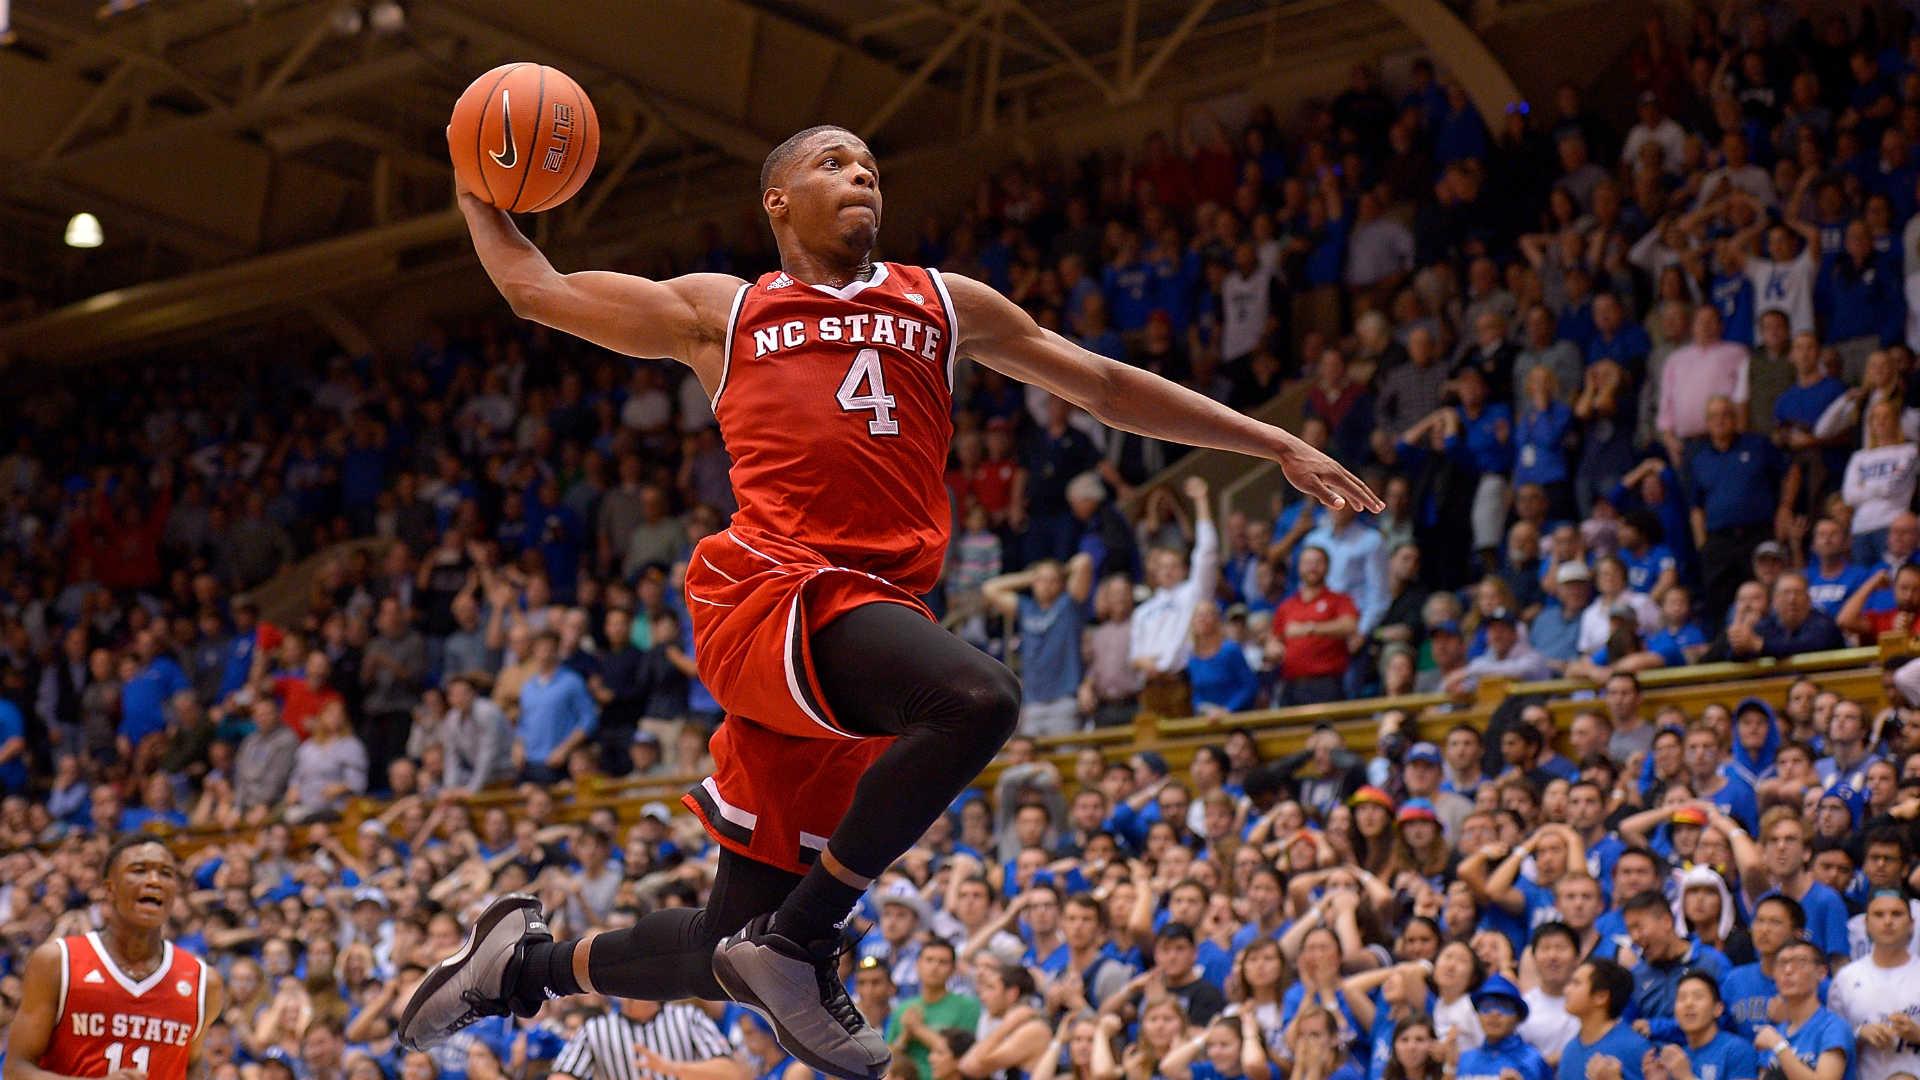 Five Views Of NC States Drought Ending Win At Duke NCAA